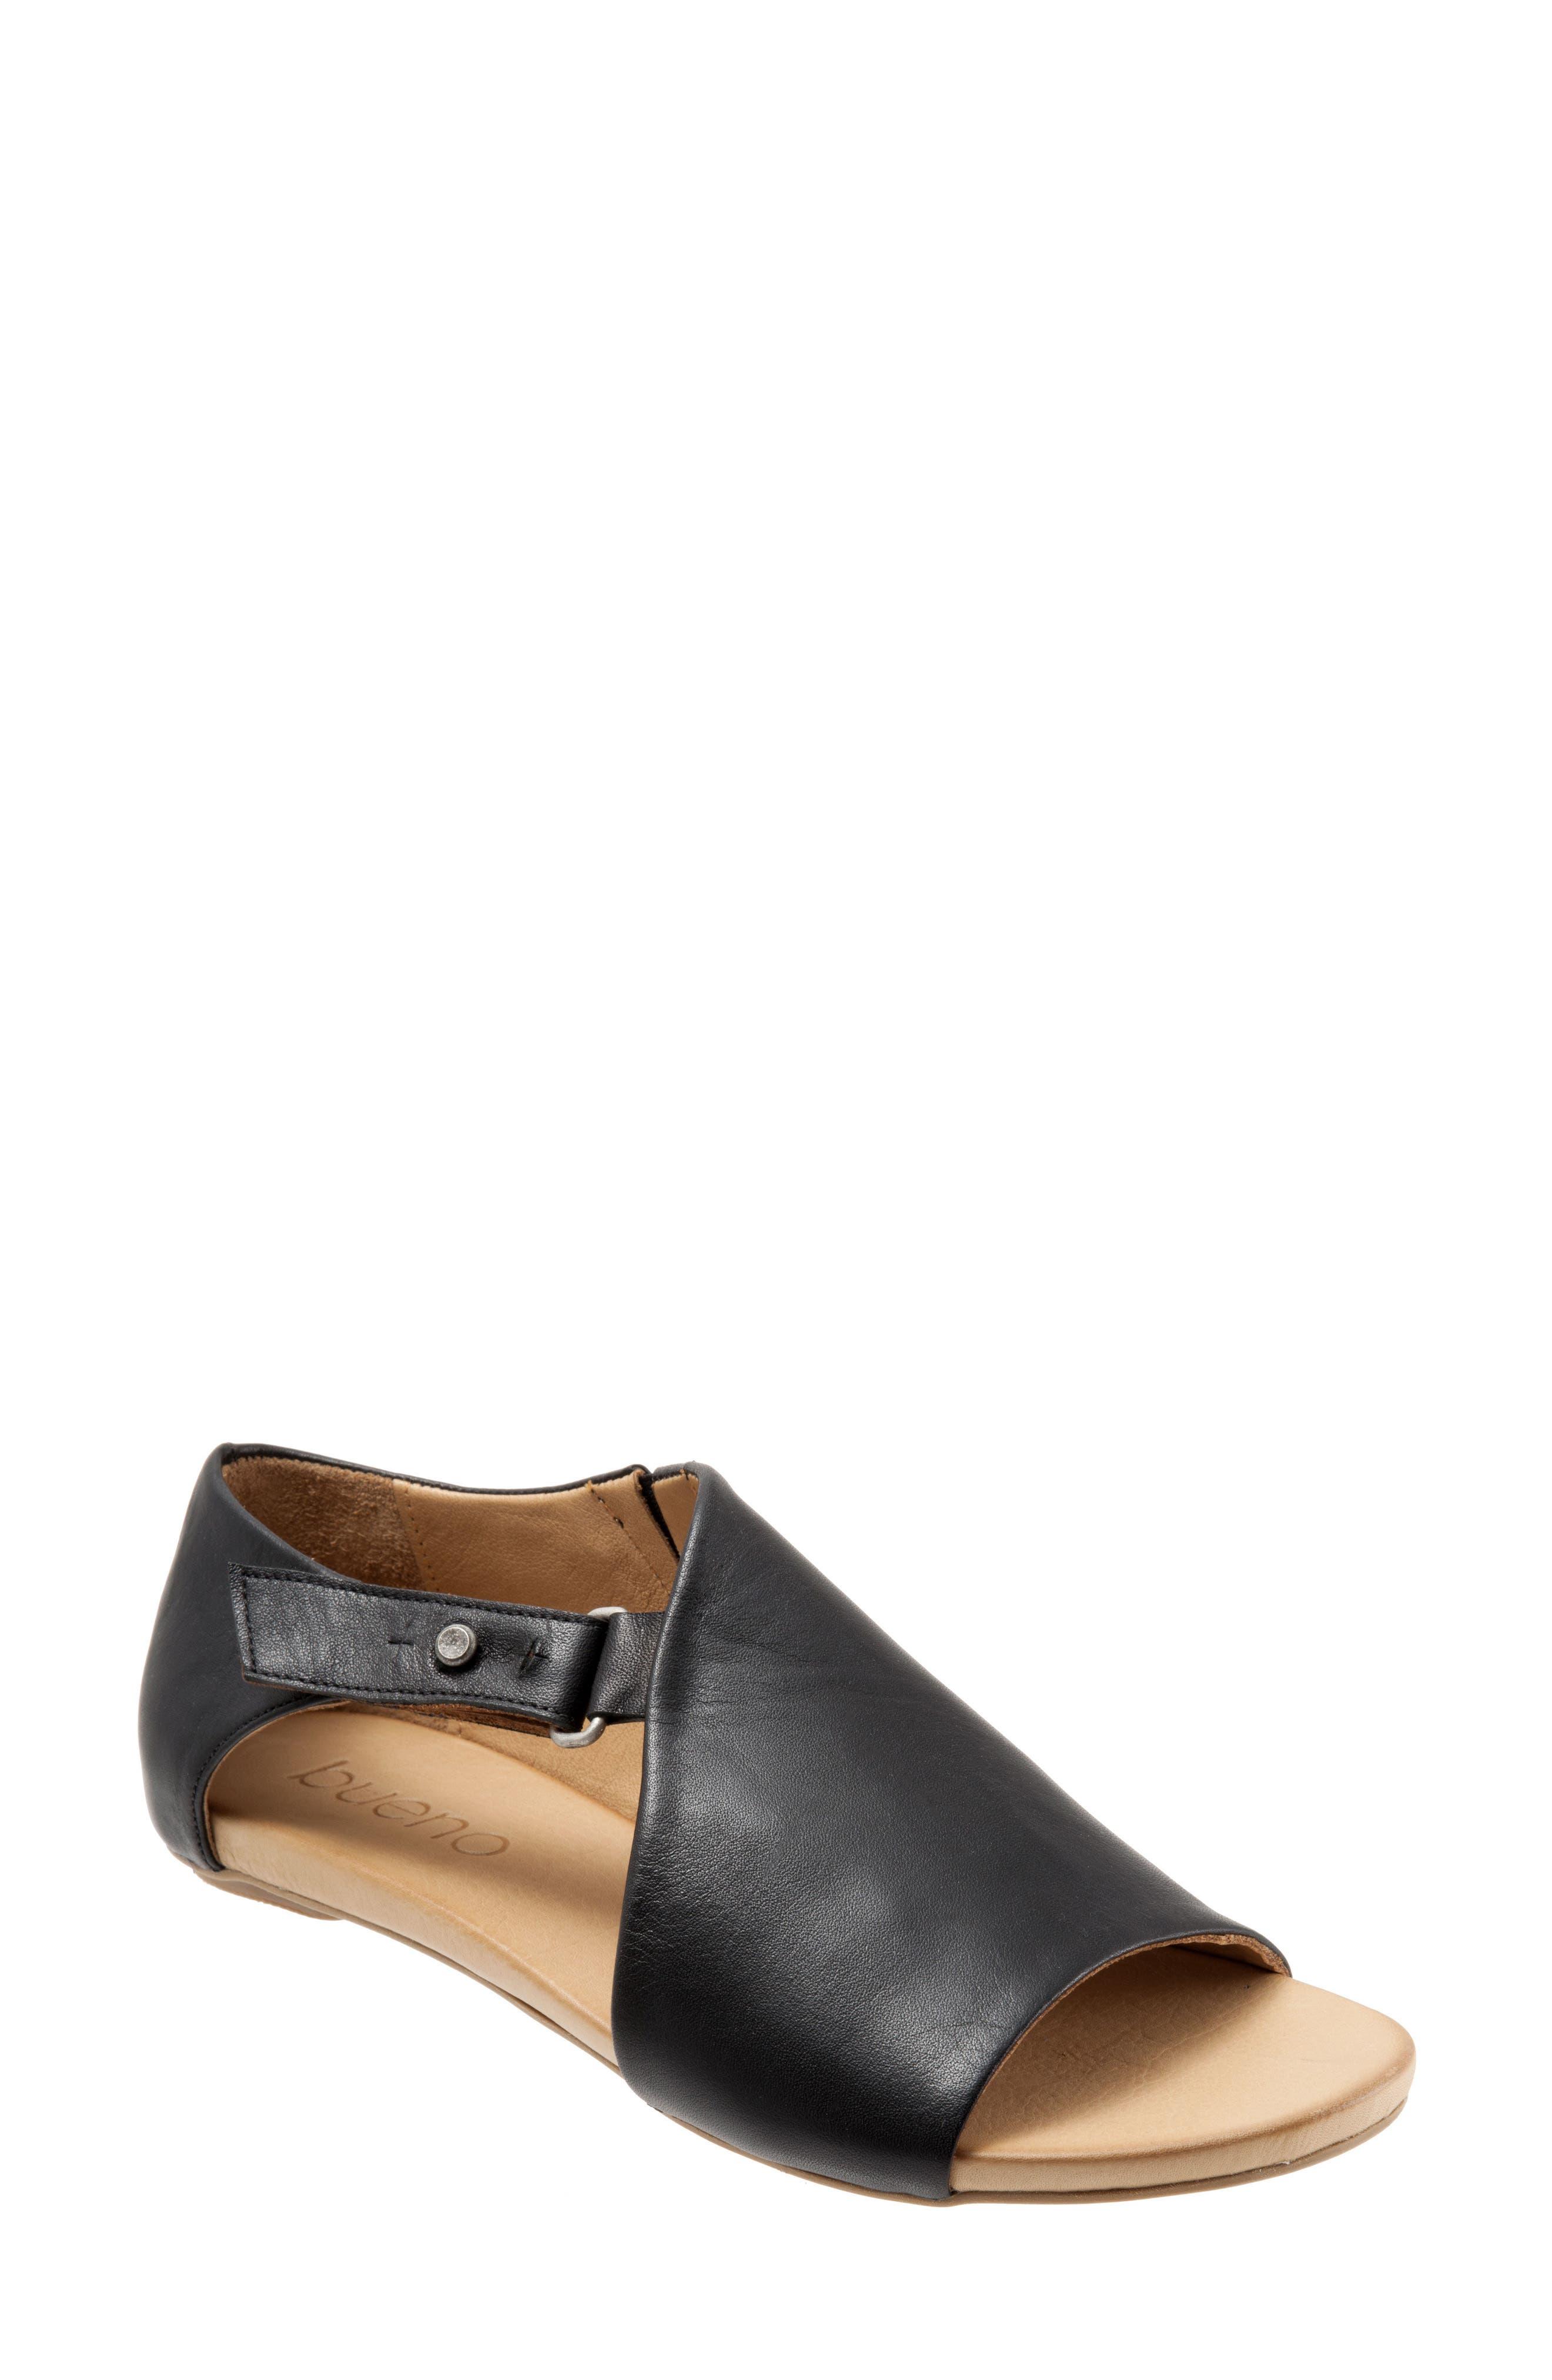 Kale Sandal,                         Main,                         color, BLACK LEATHER